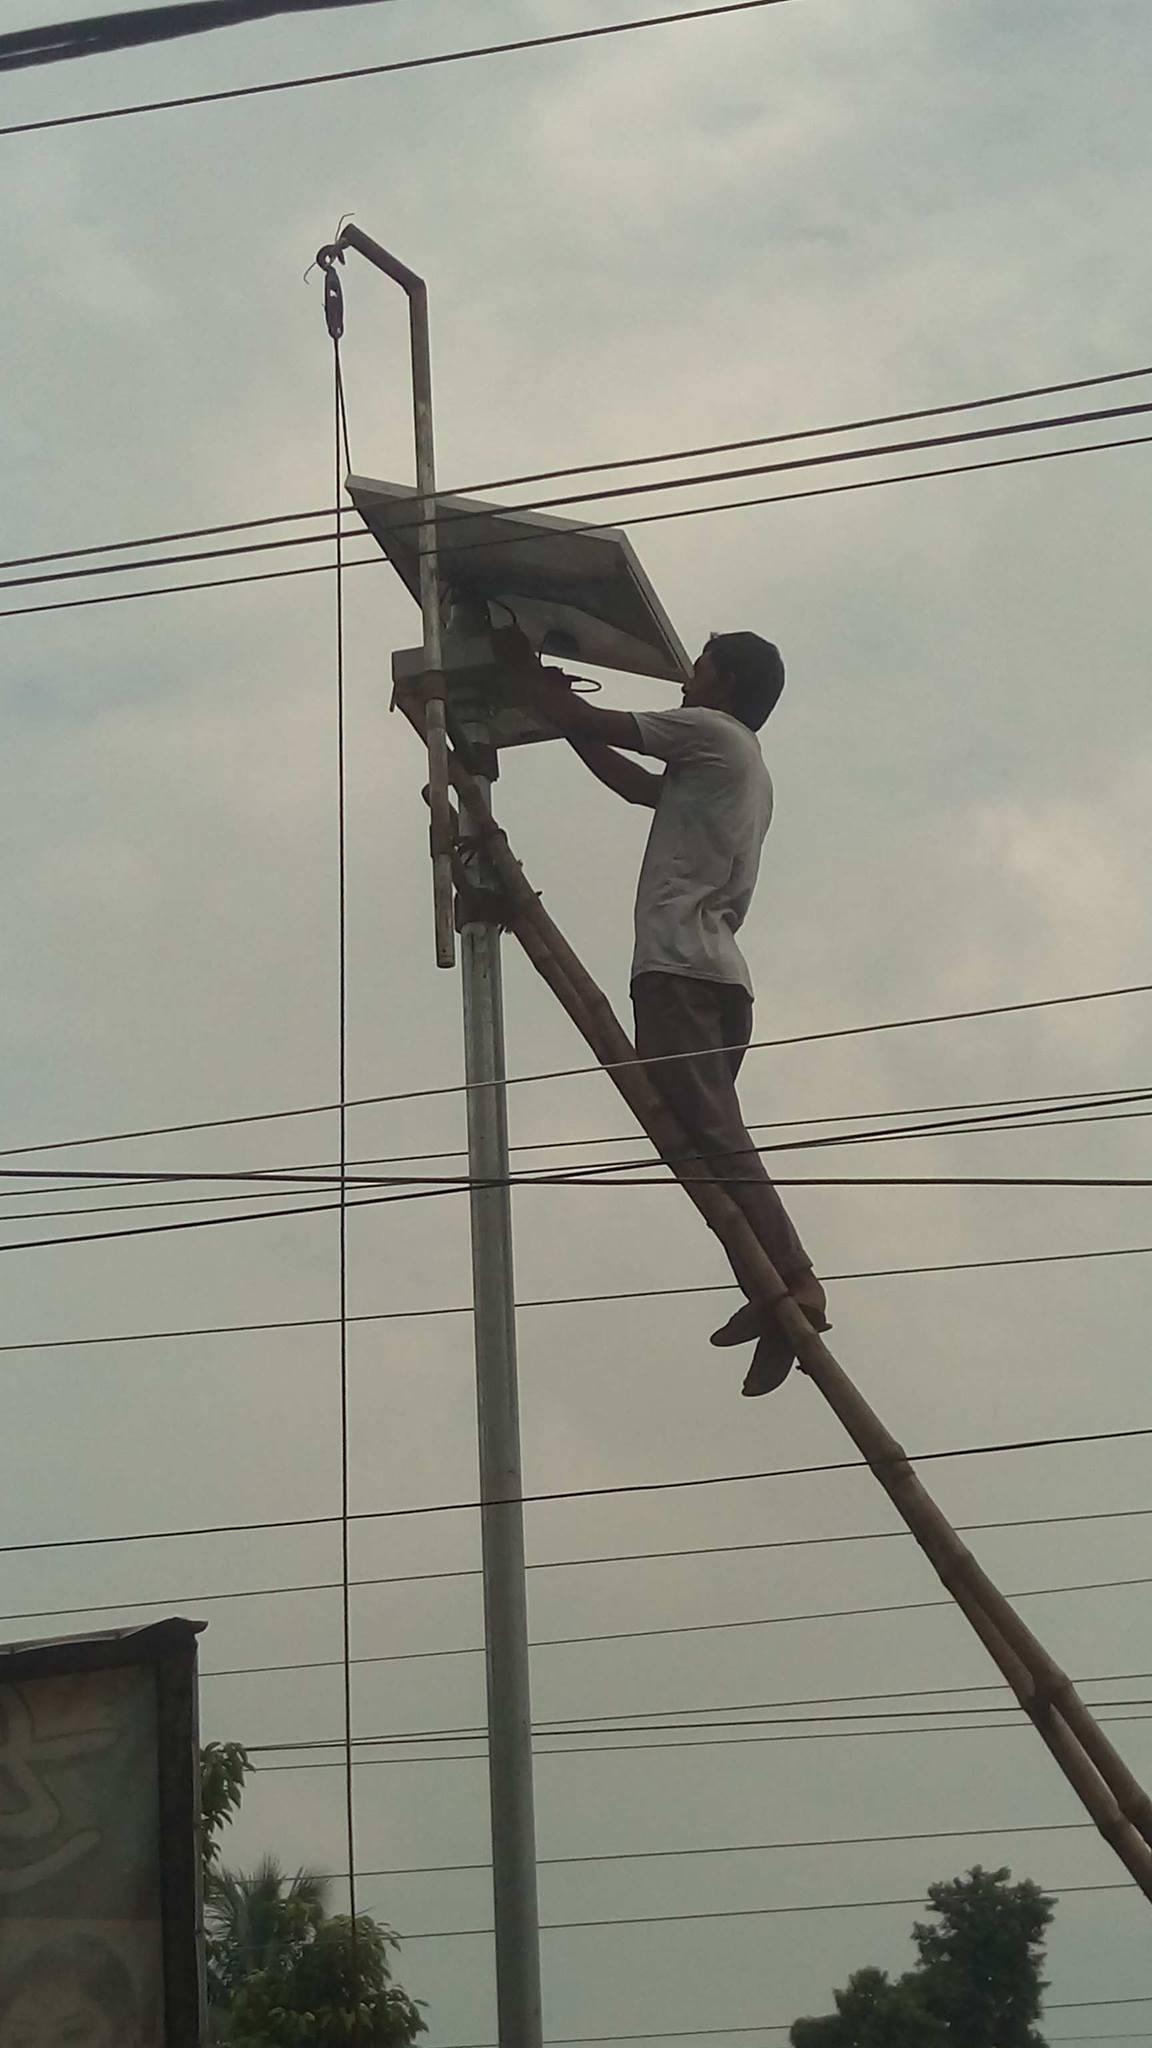 Solar Street Light Maintainance